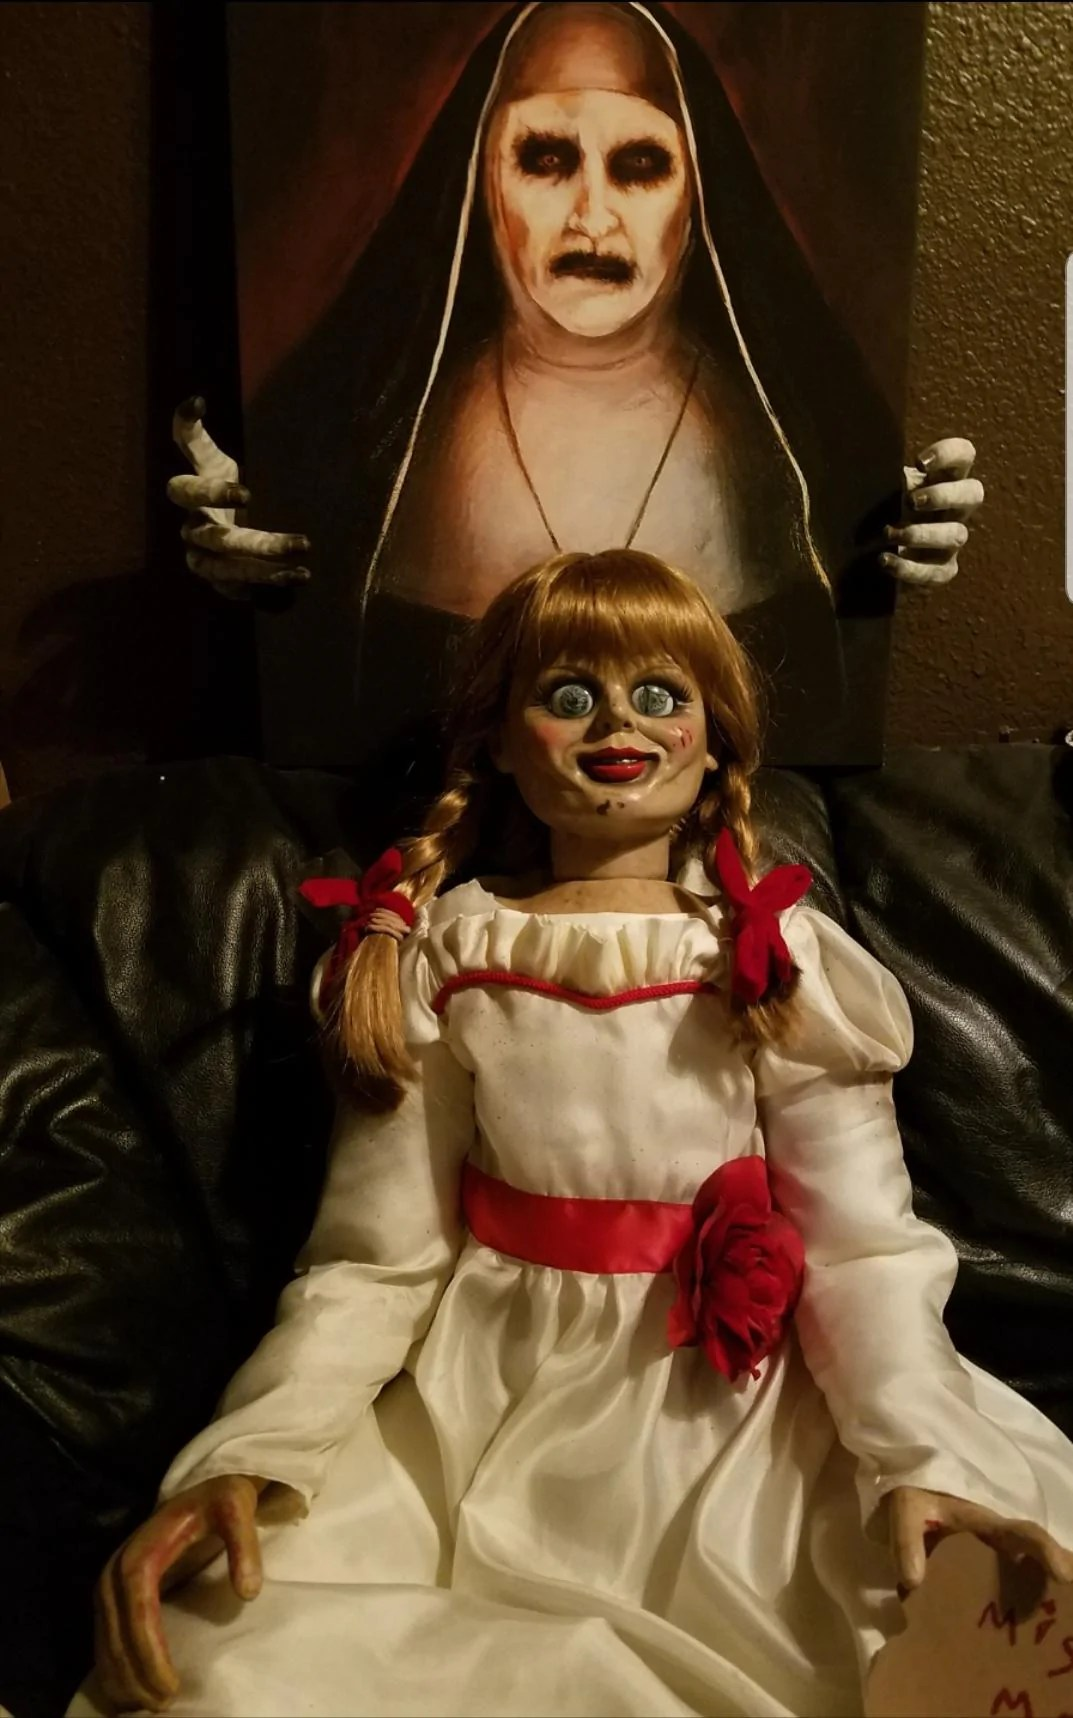 animatronic annabelle doll the